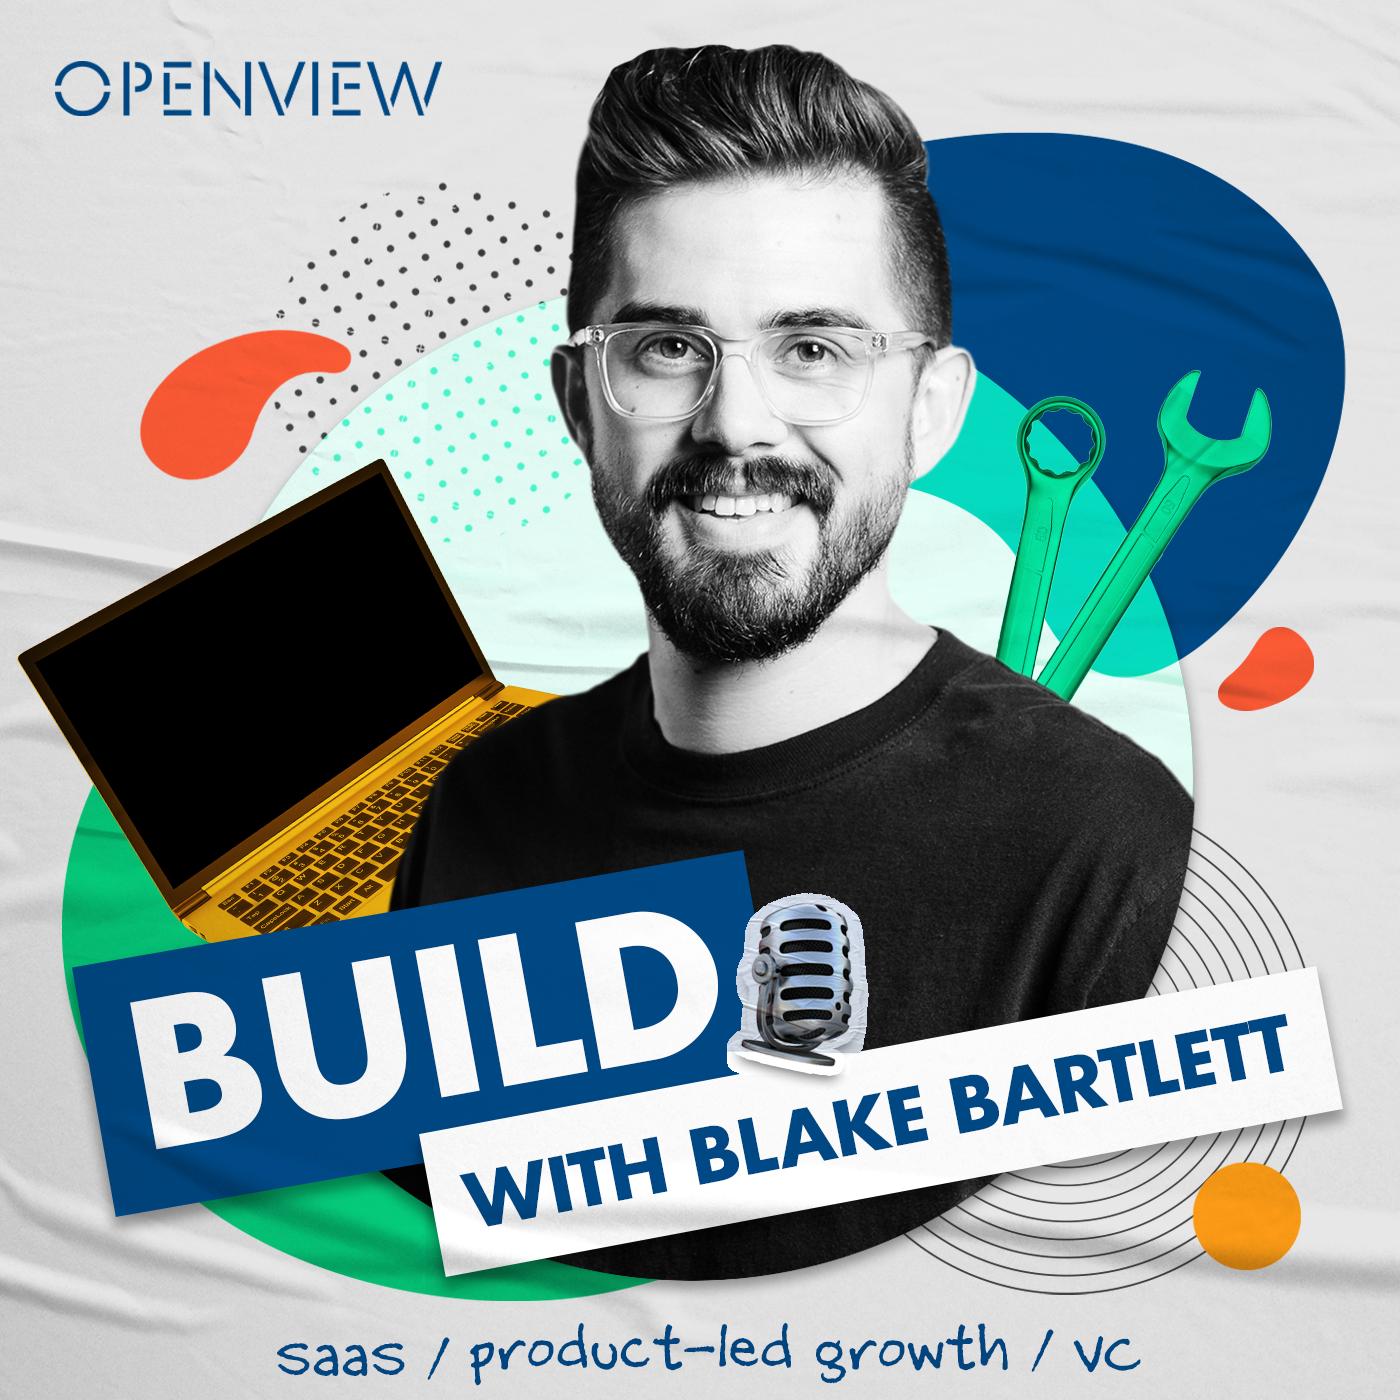 BUILD with Blake Bartlett